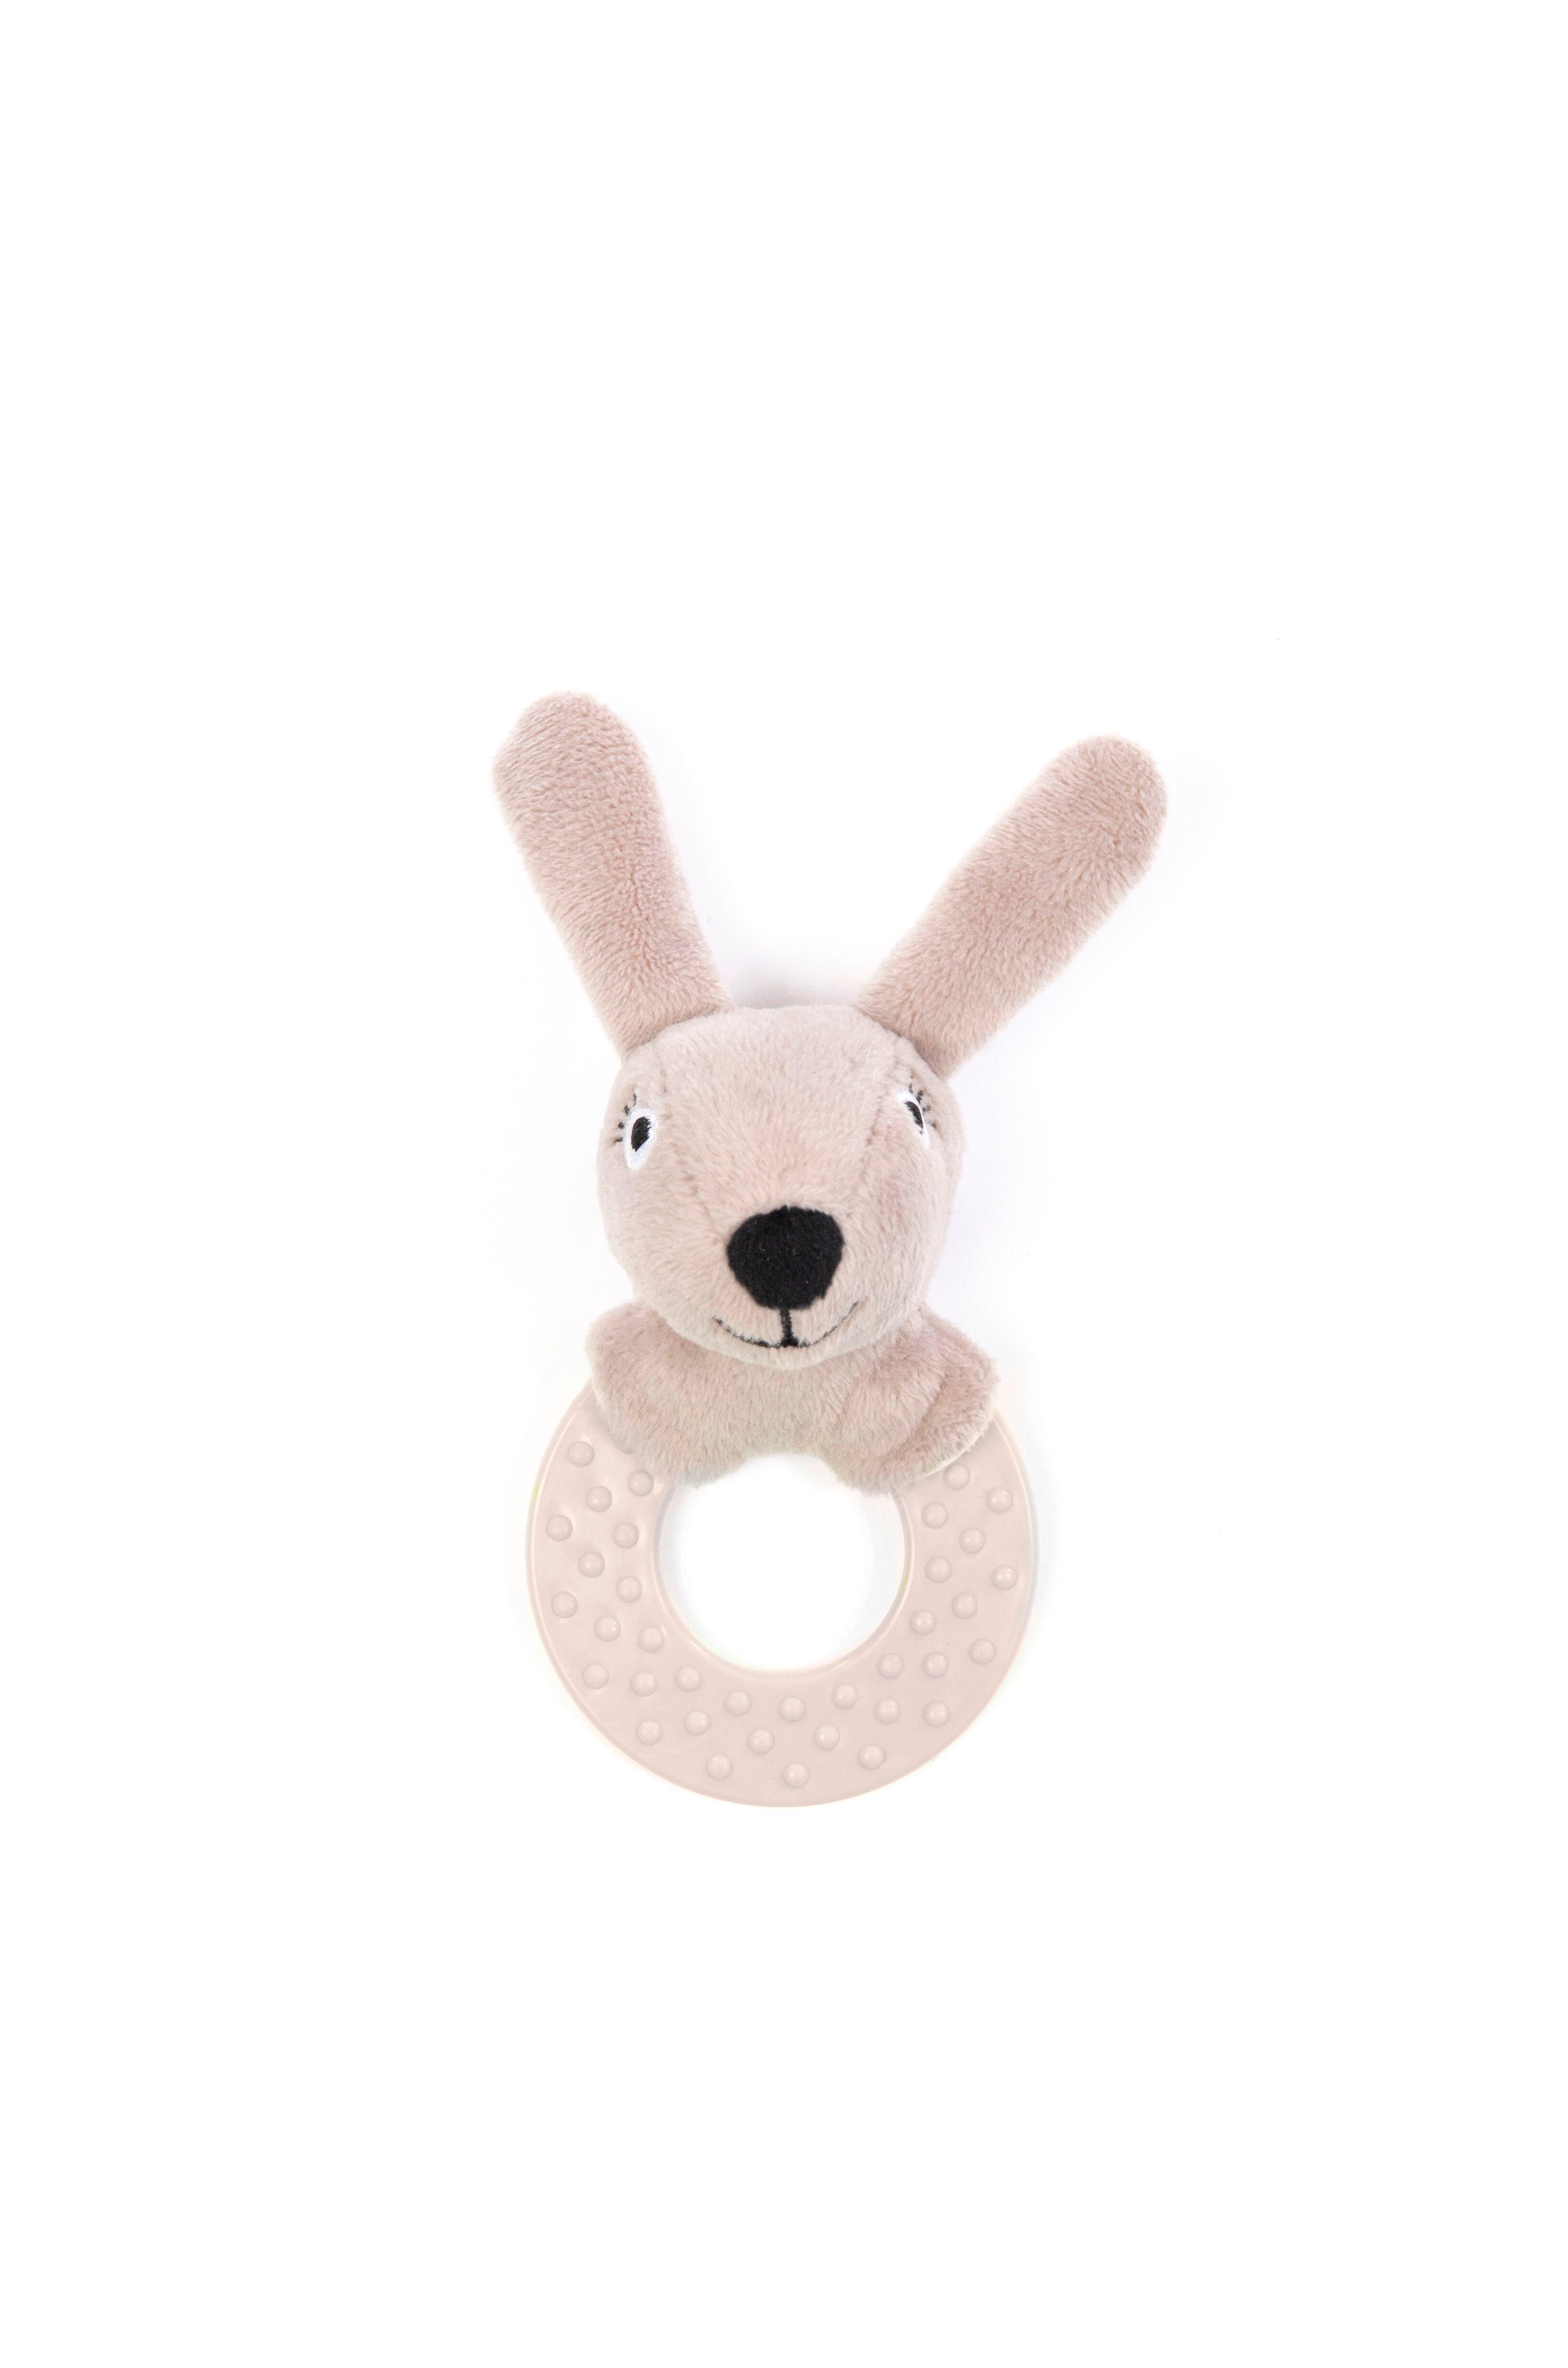 Smallstuff - Rattle Rubber Ring Rabbit - Powder